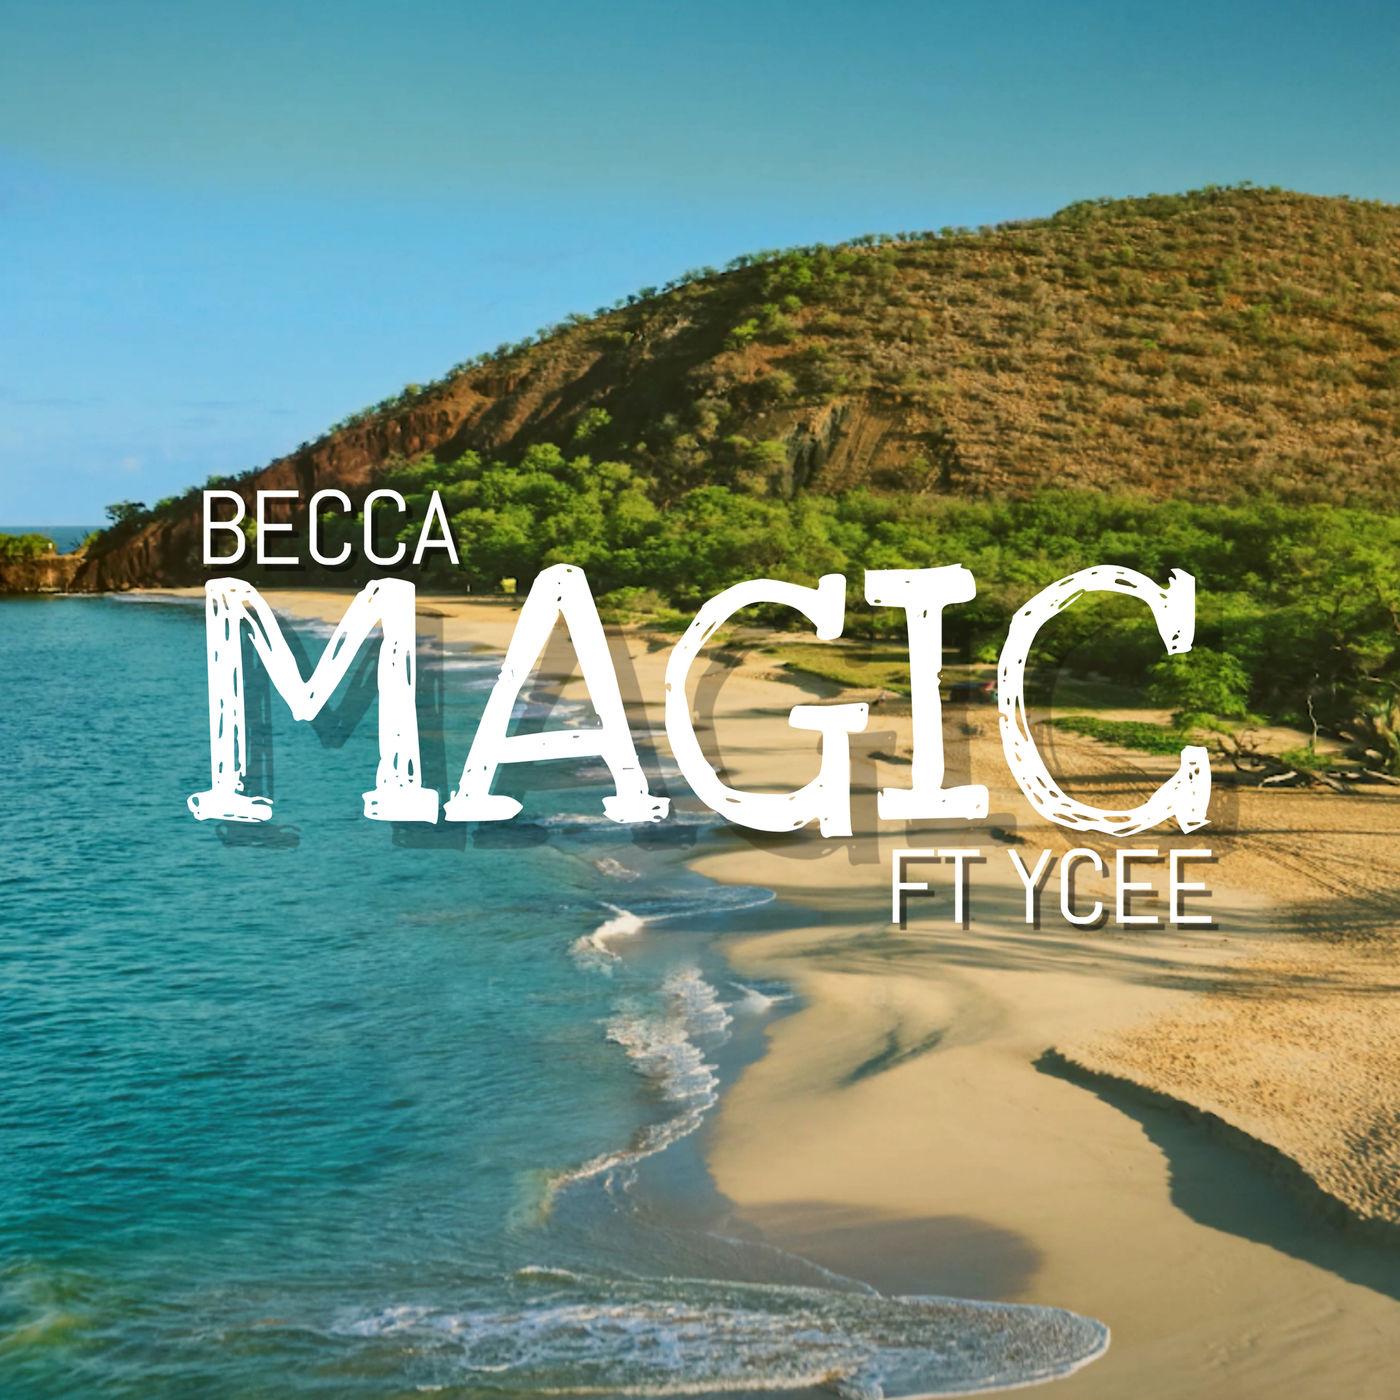 Becca feat. YCee – Magic (Prod. by Adey)